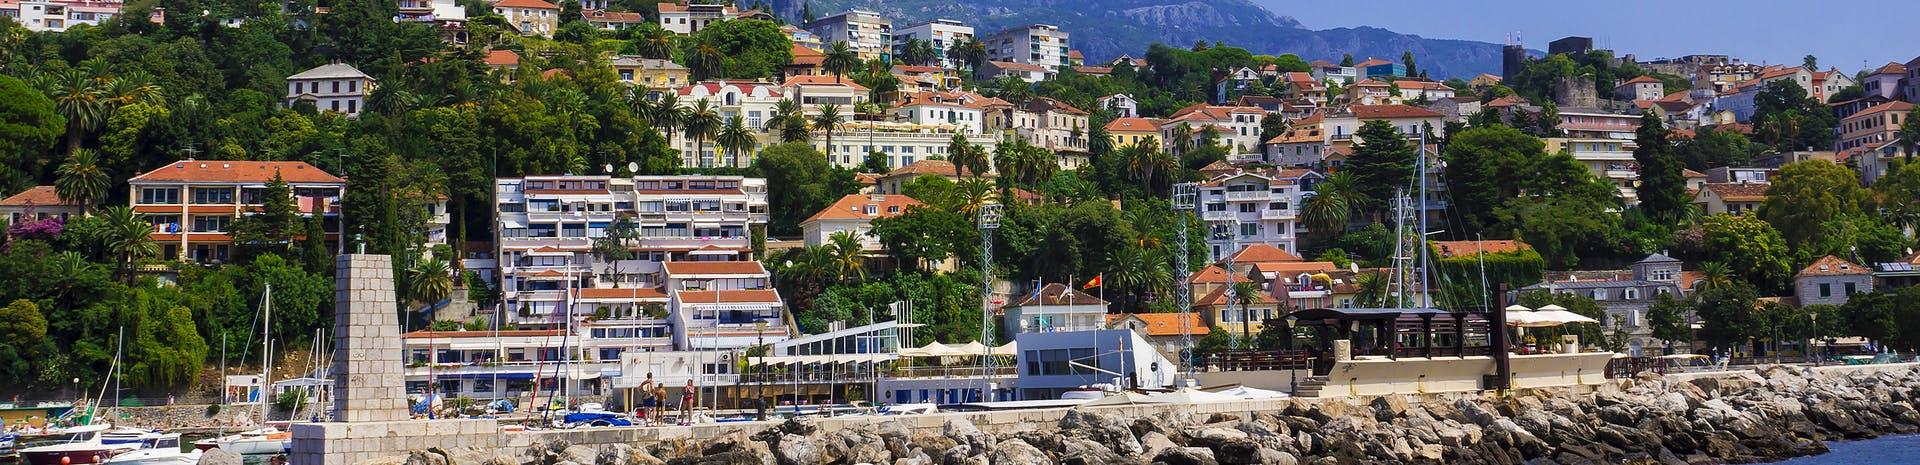 Picture of Herceg Novi